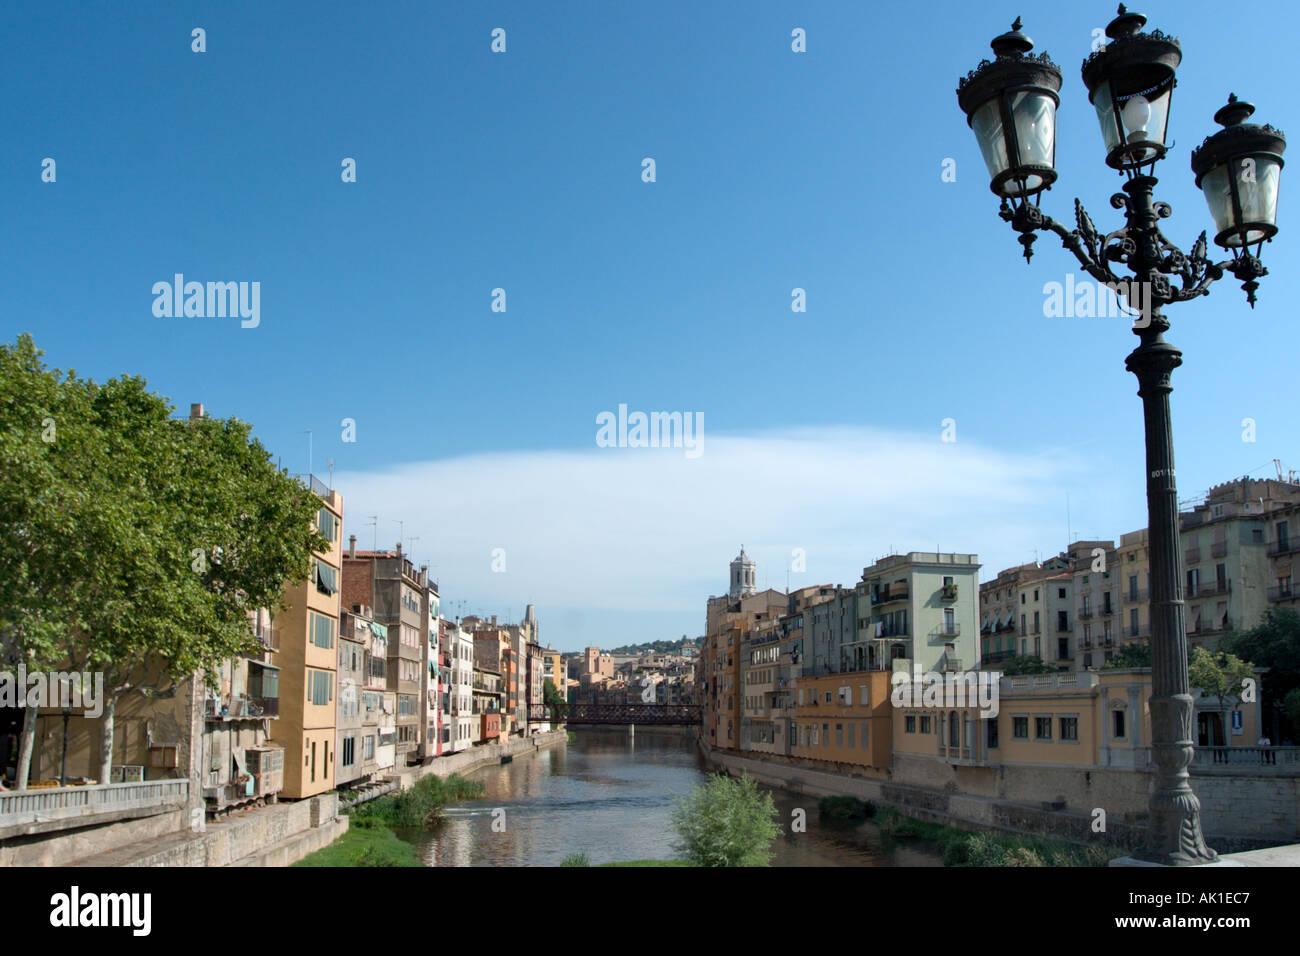 River Onyar from the Pont de Pedra, Old City, Girona (Gerona), Catalunya, Spain Stock Photo